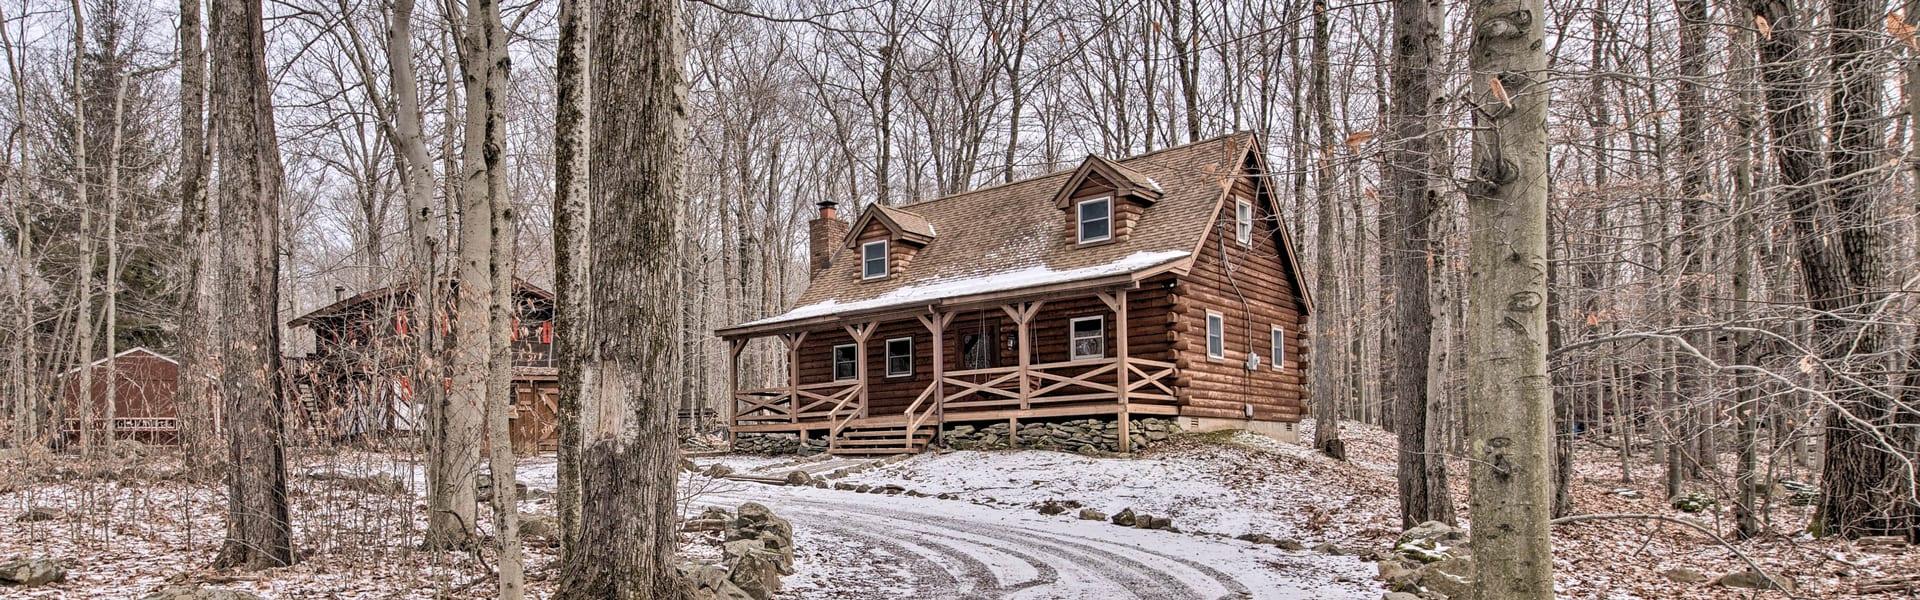 A snowy cabin in the Poconos, PA.